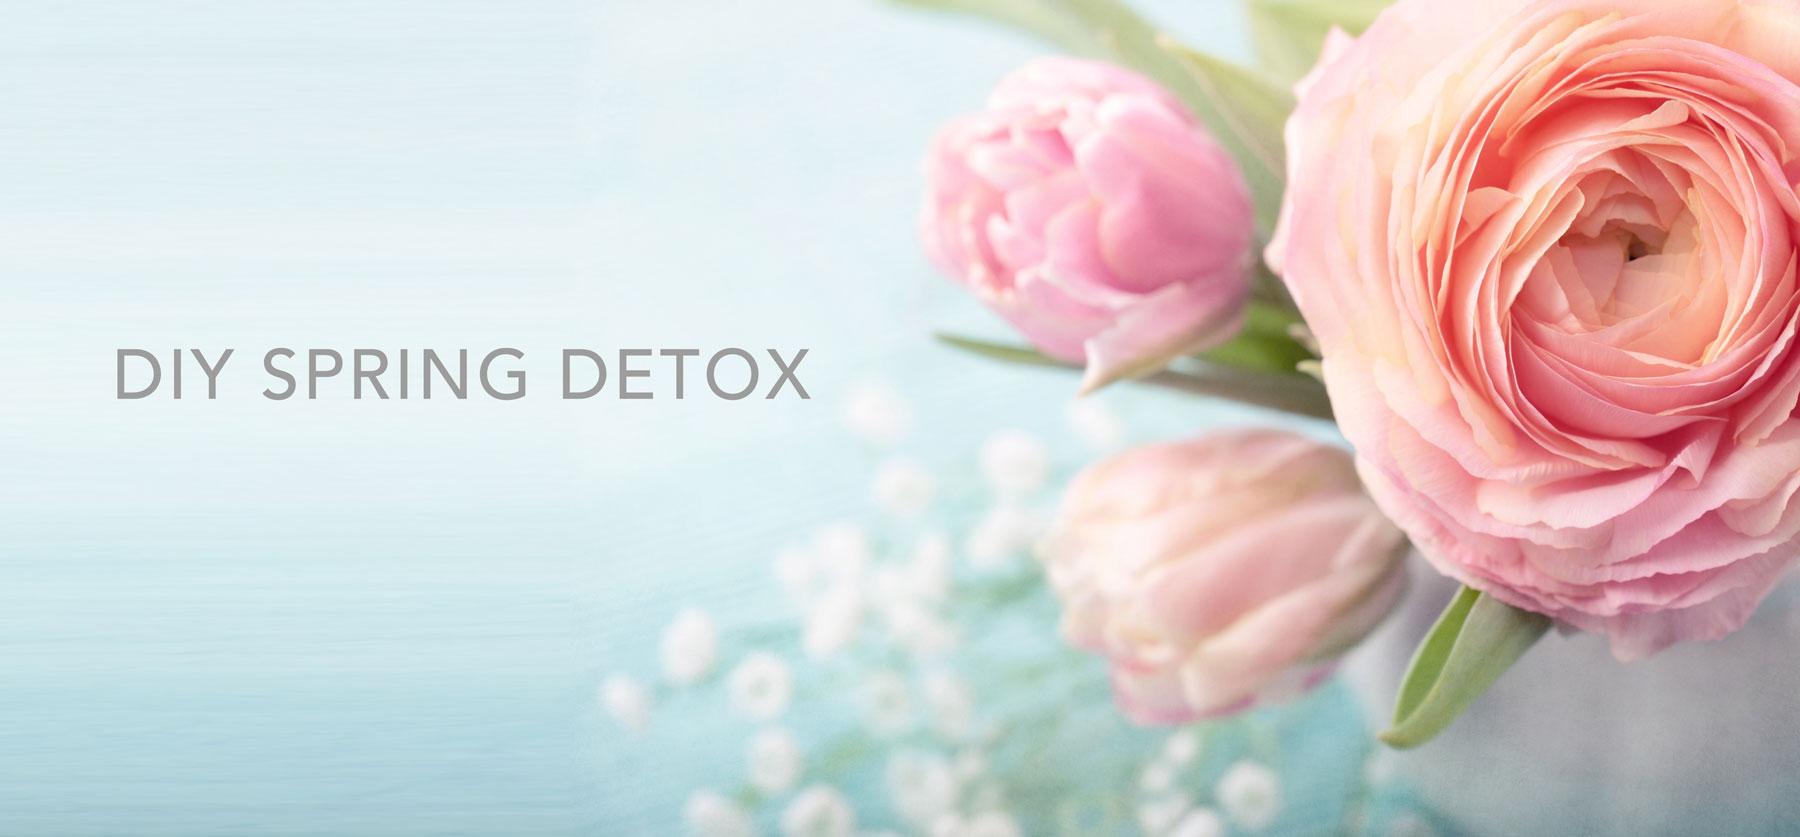 DIY Spring Detox